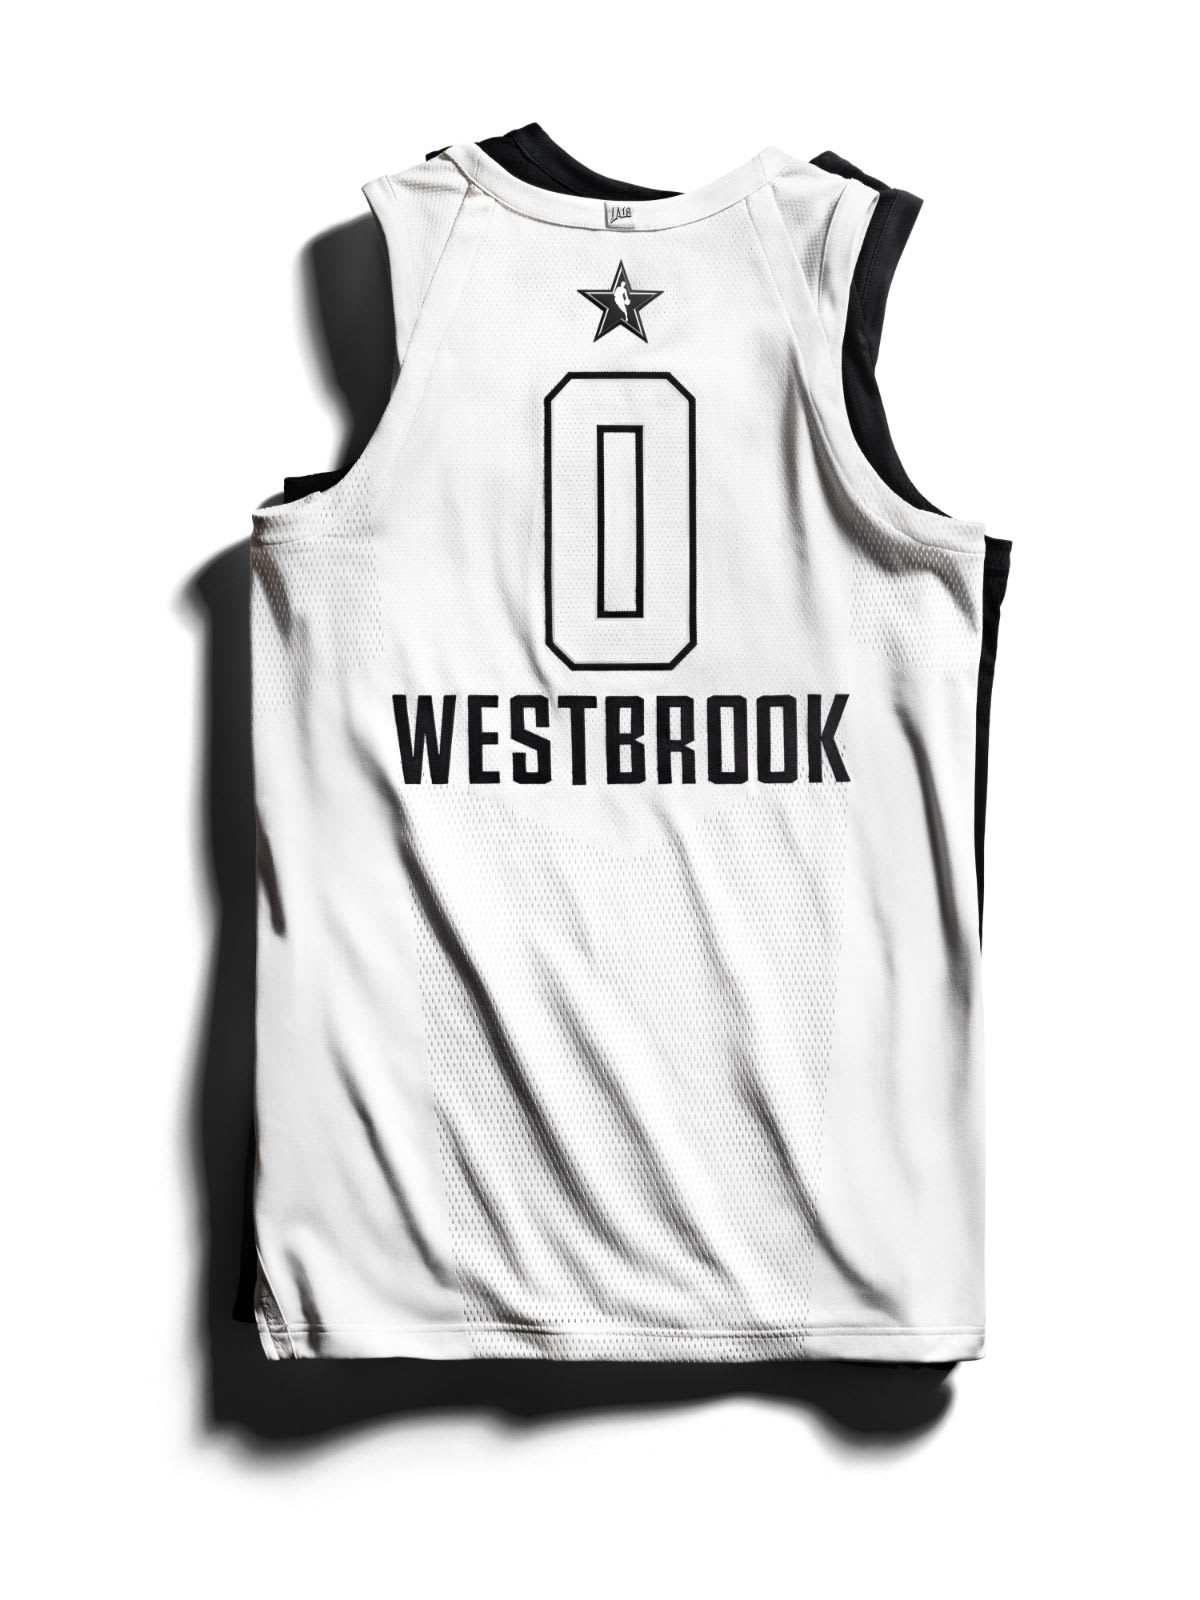 Jordan Brand 2018 NBA All-Star Jerseys Westbrook Back